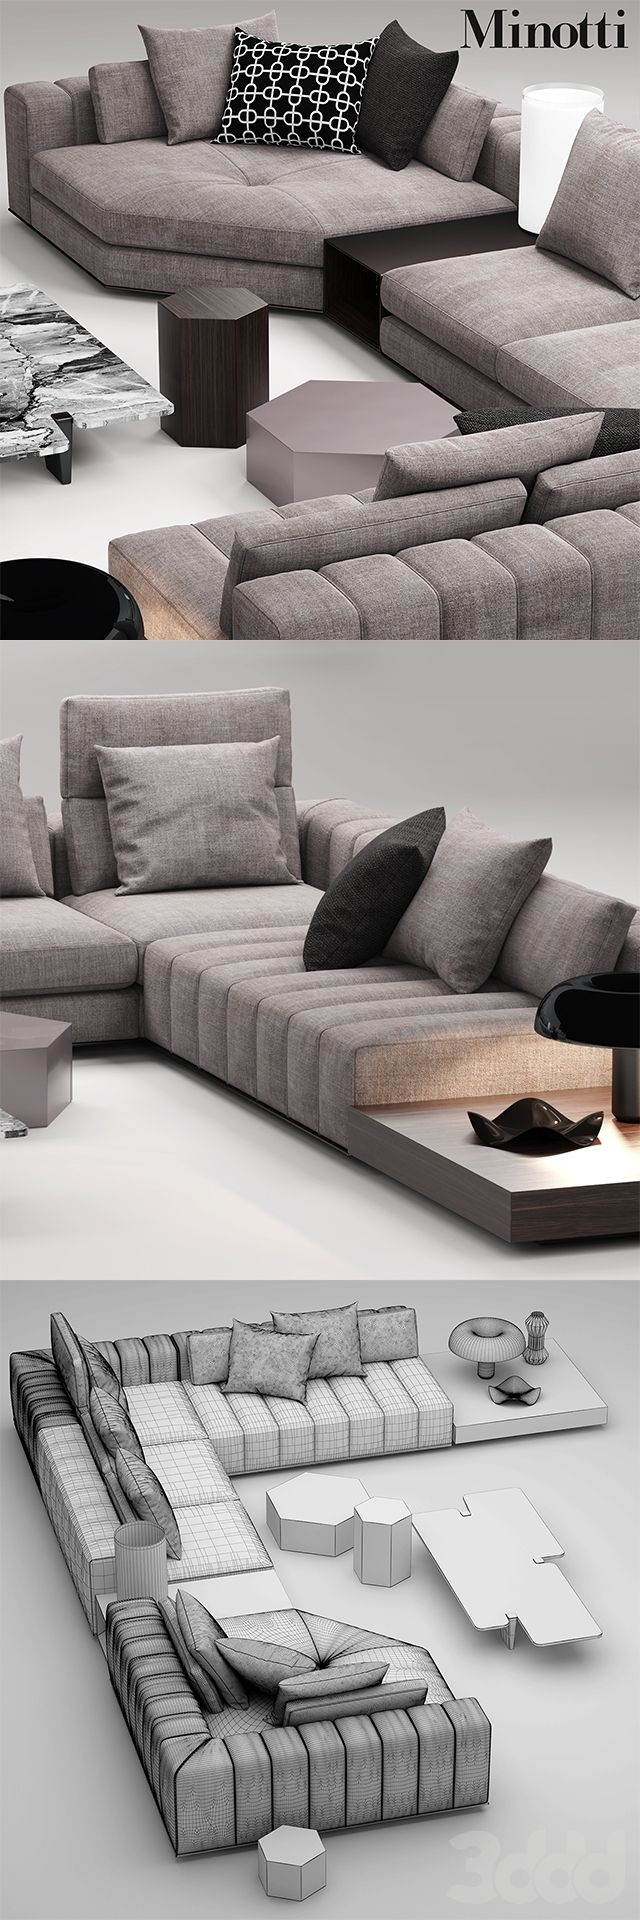 3d модели: Диваны   Minotti Freeman Seating System